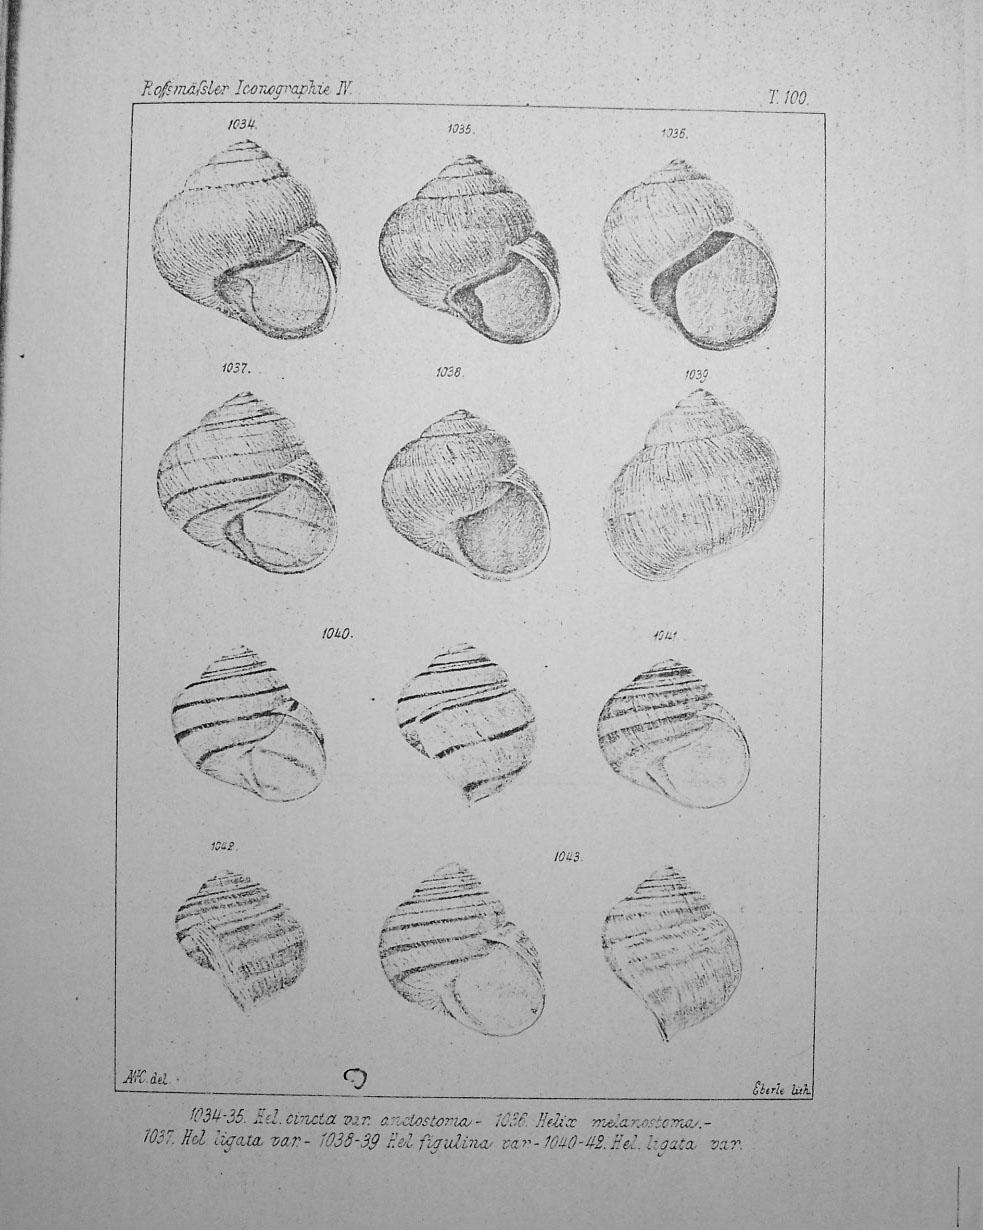 Variazioni in Helix ligata